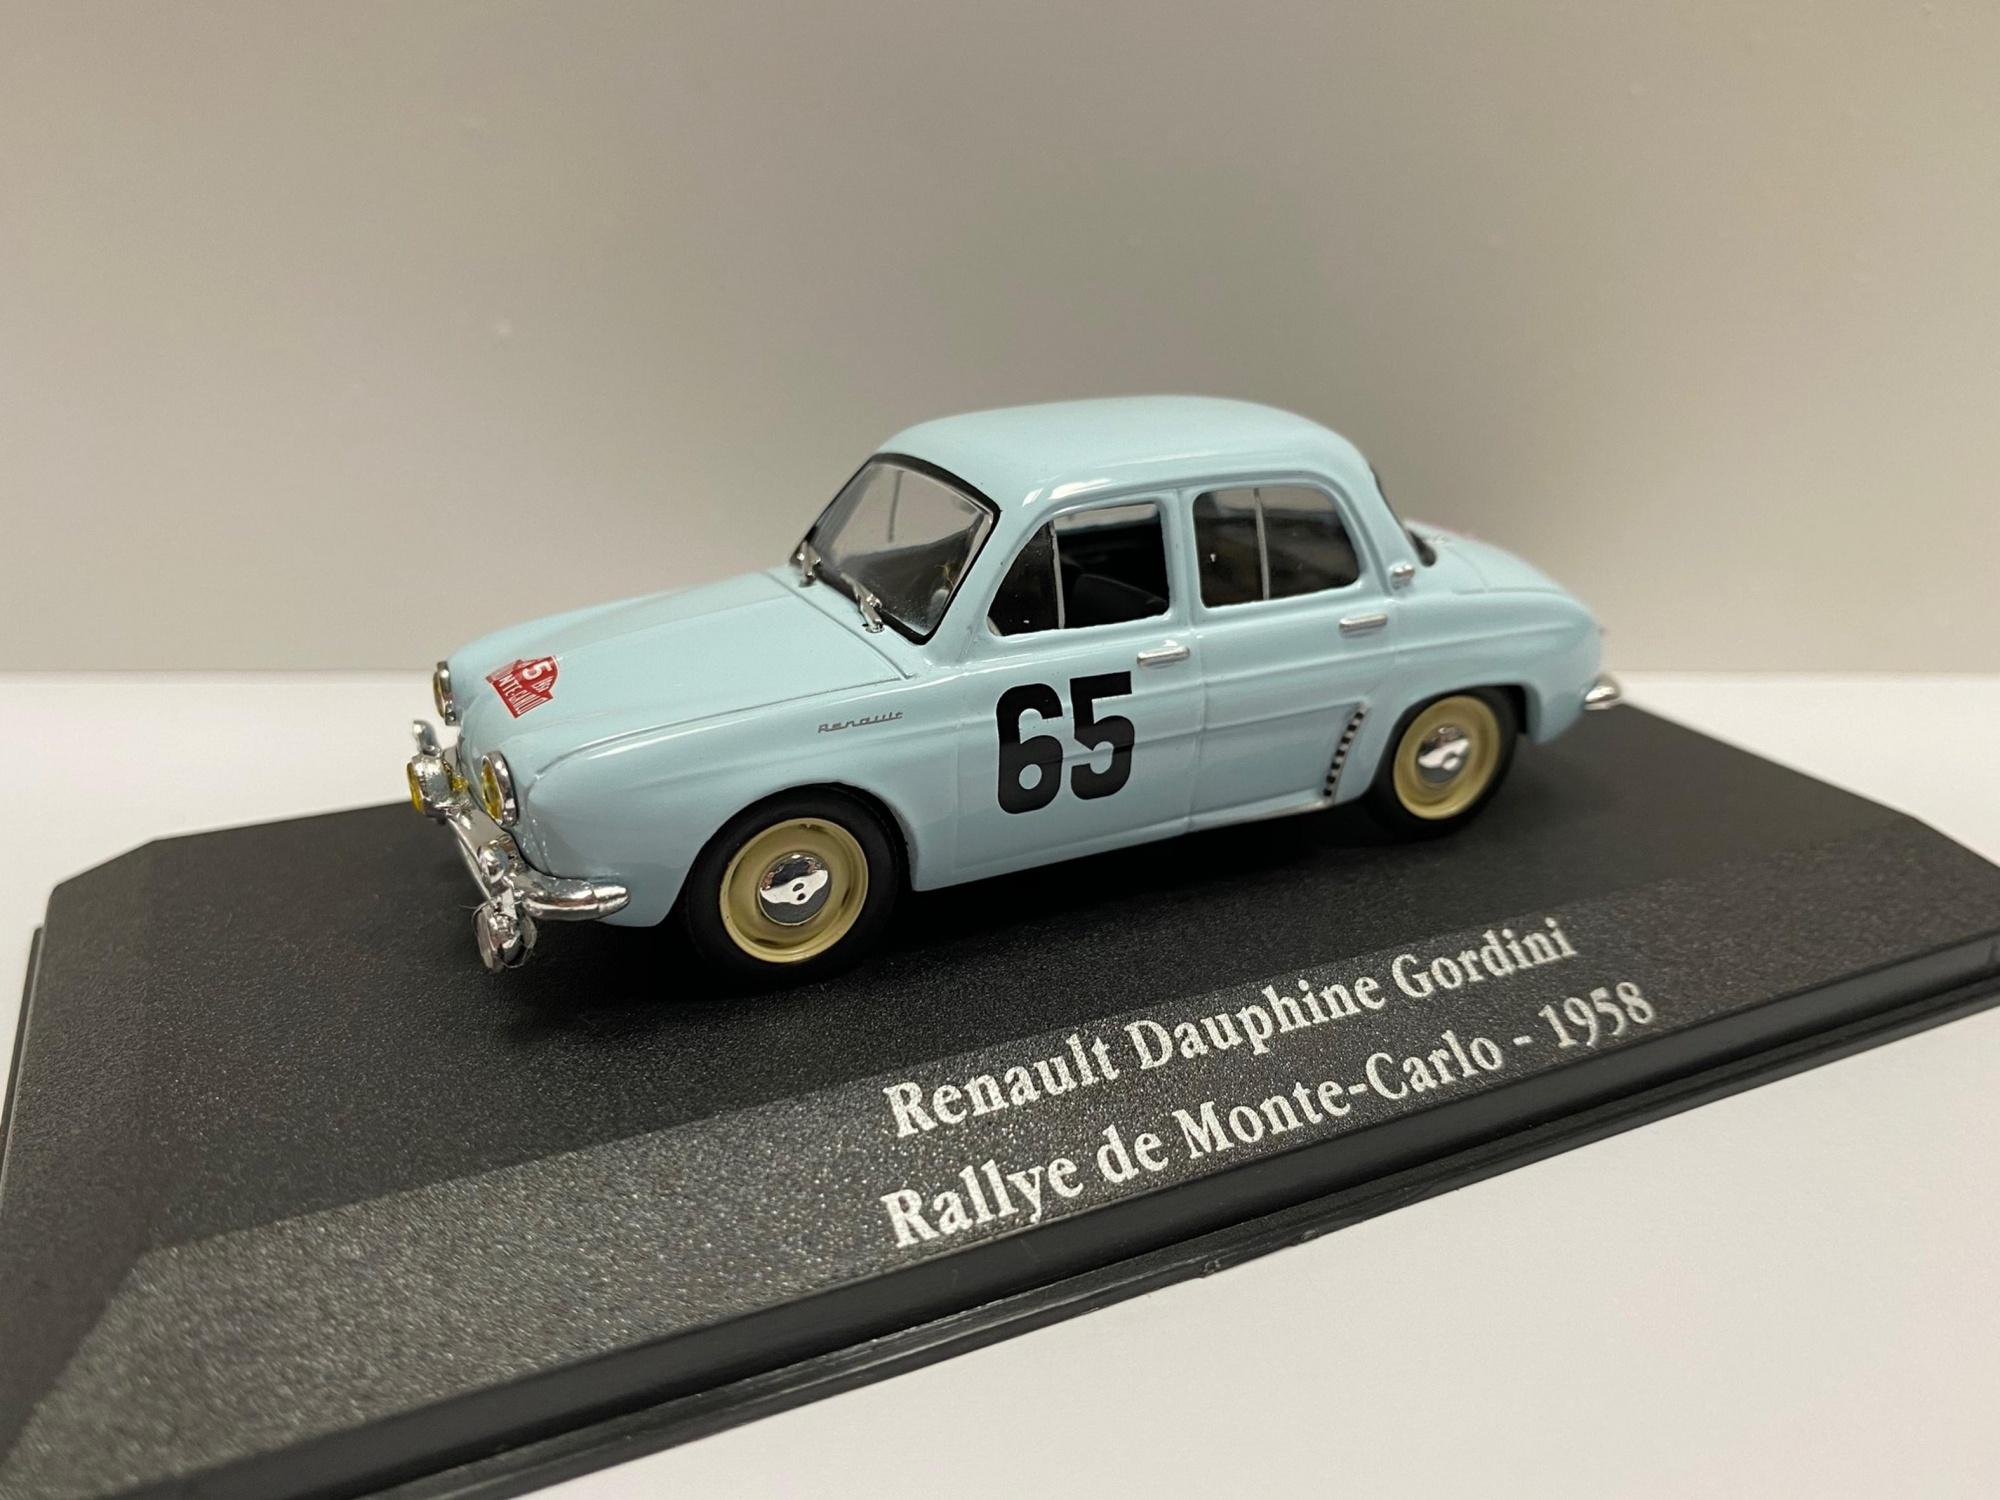 Renault Dauphine Gordini Rallye de Monte Carlo 1958